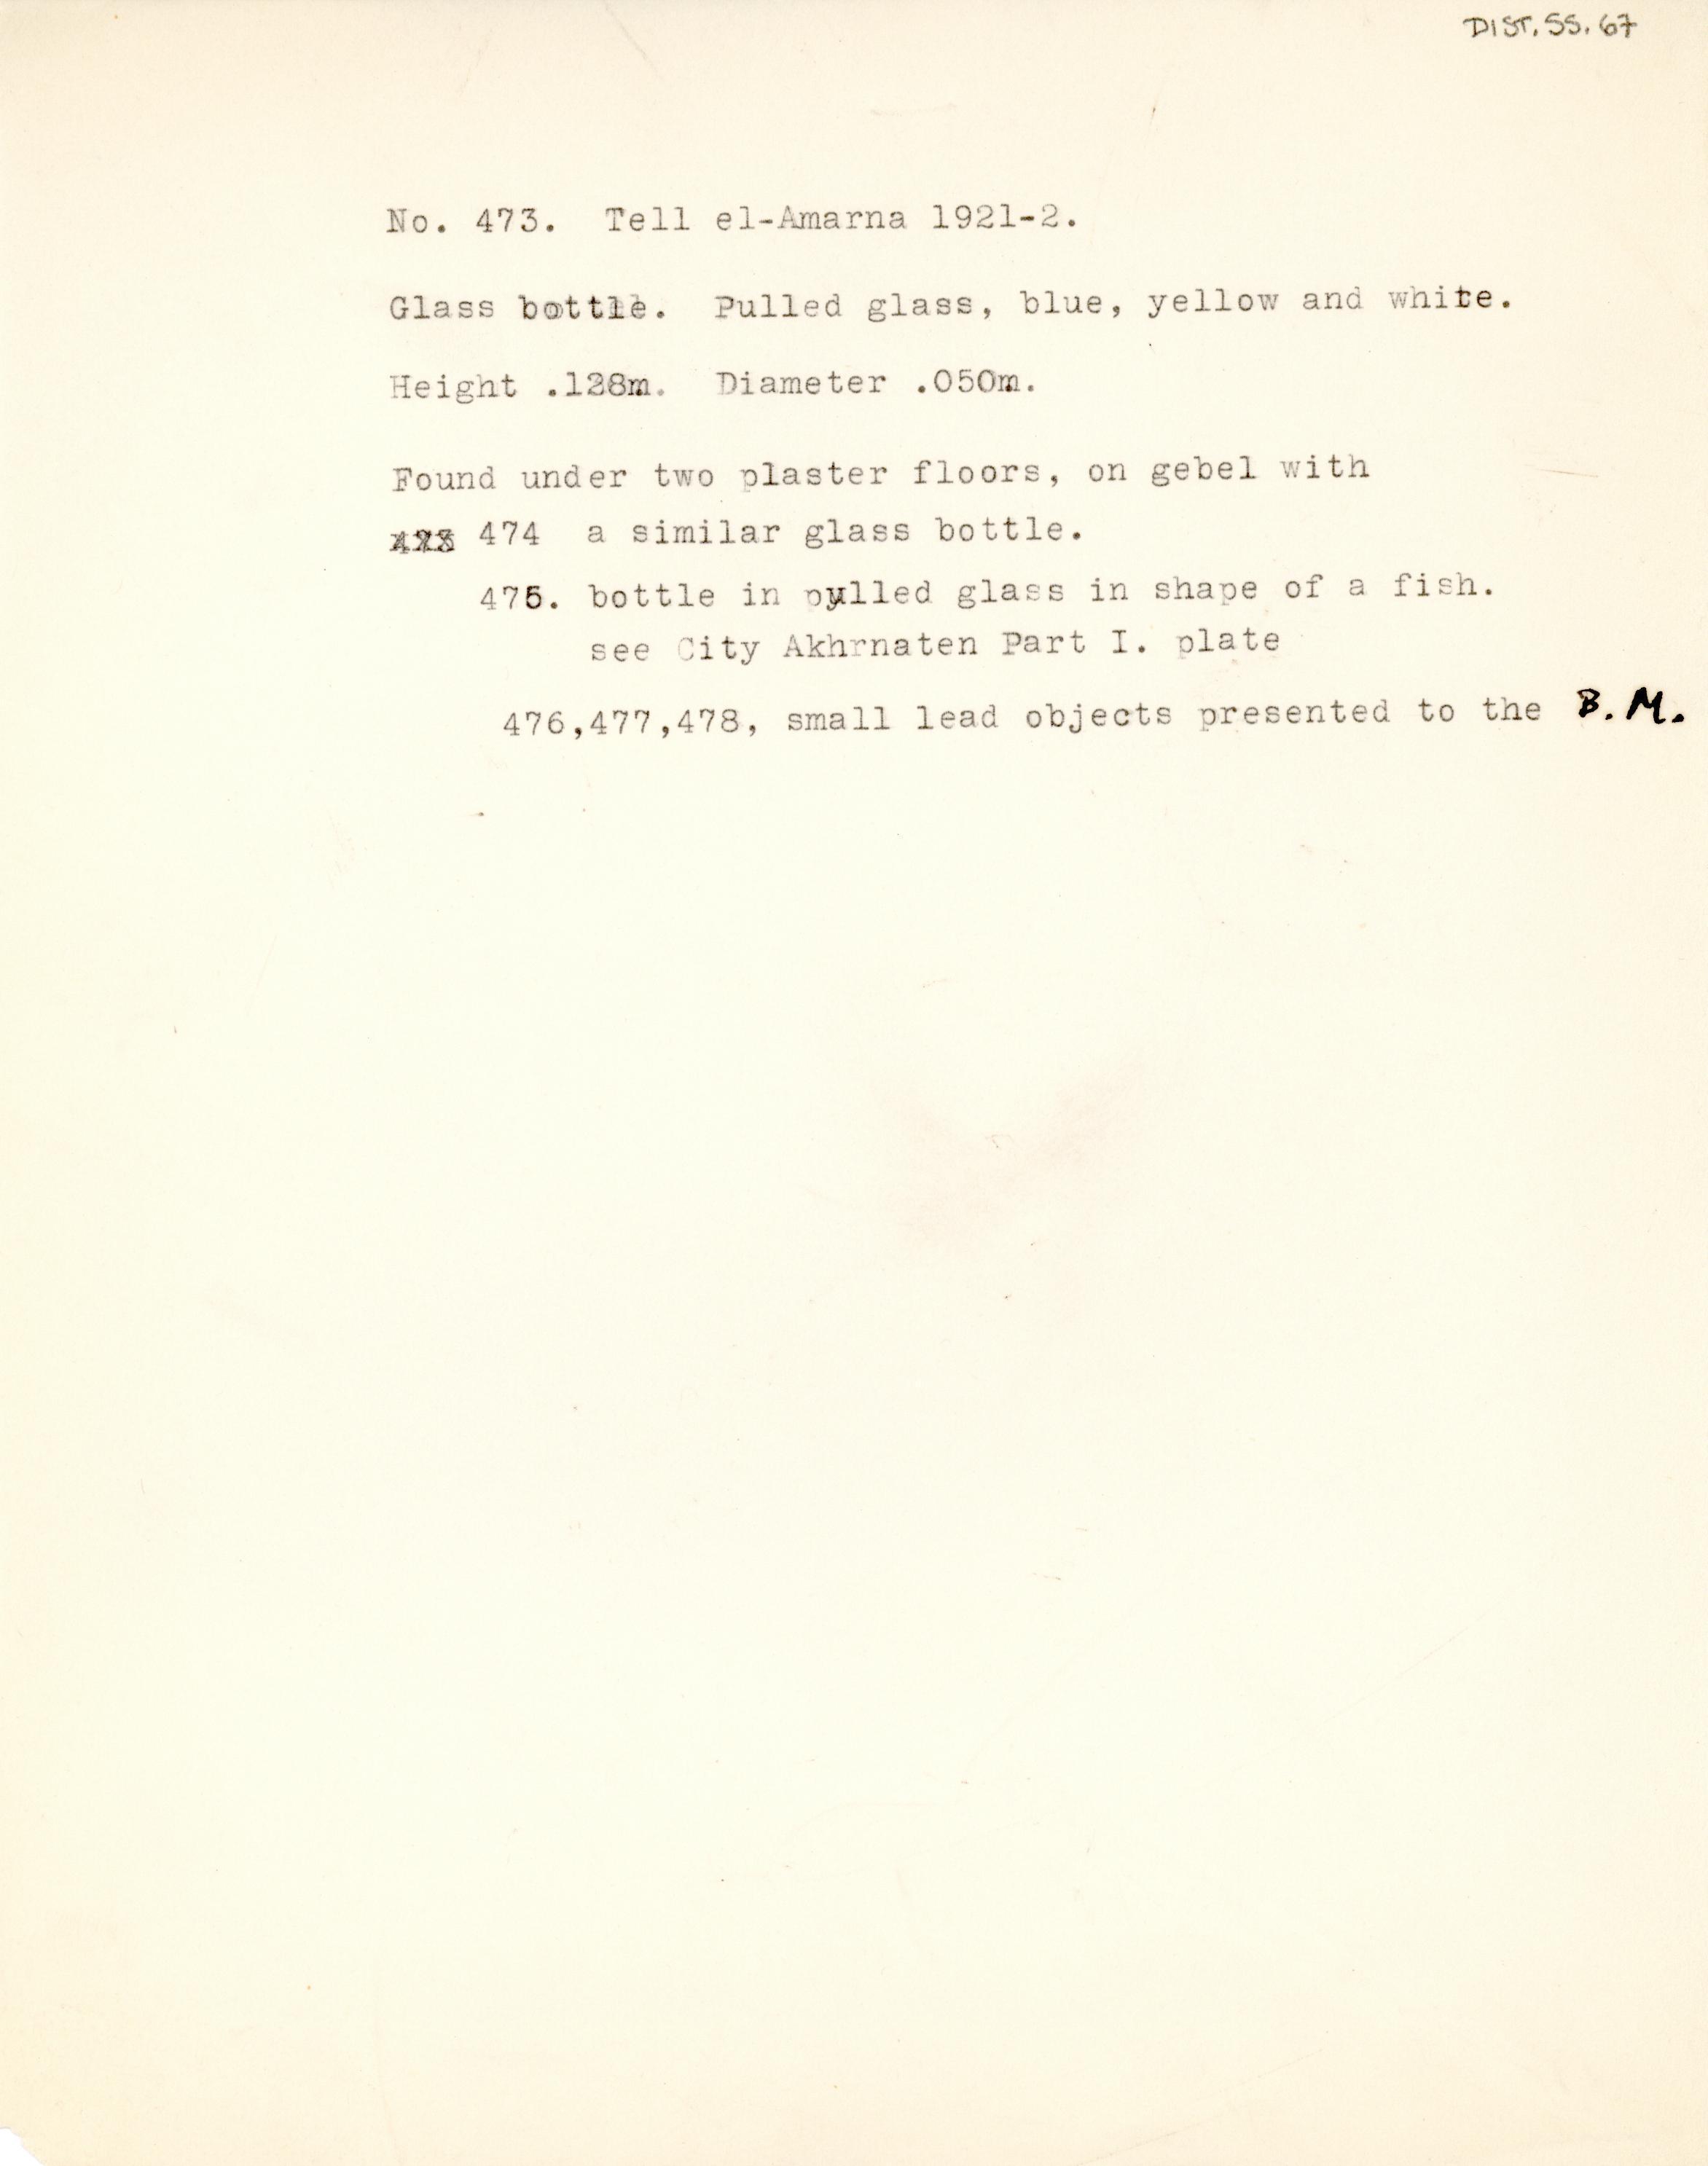 1931-44 Brooklyn Museum DIST.55.67